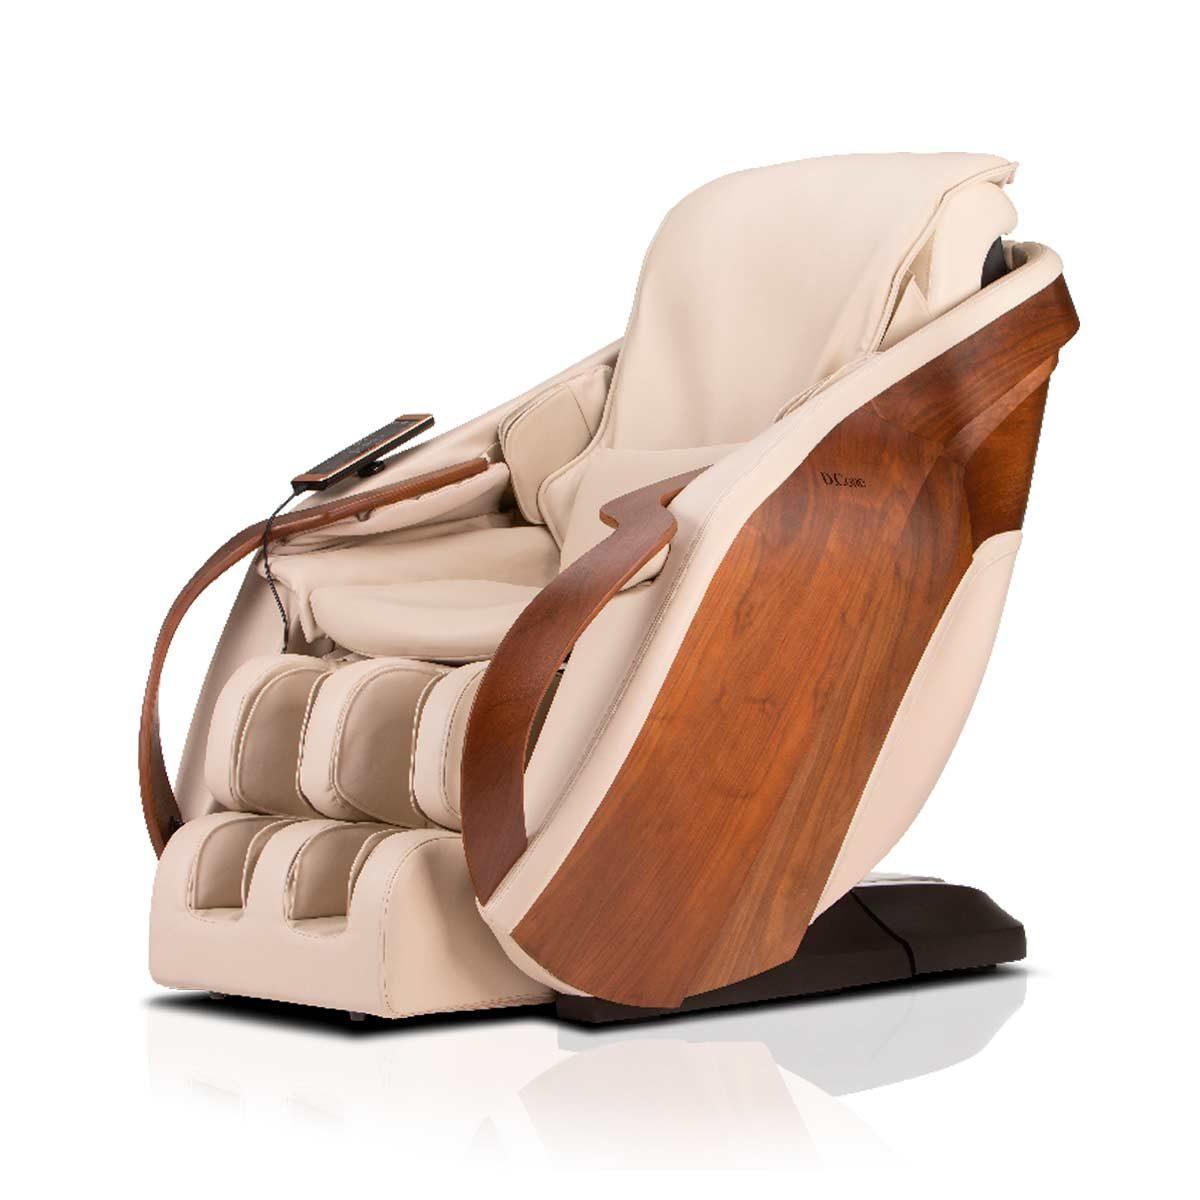 D.Core Cirrus massage chair cream hero